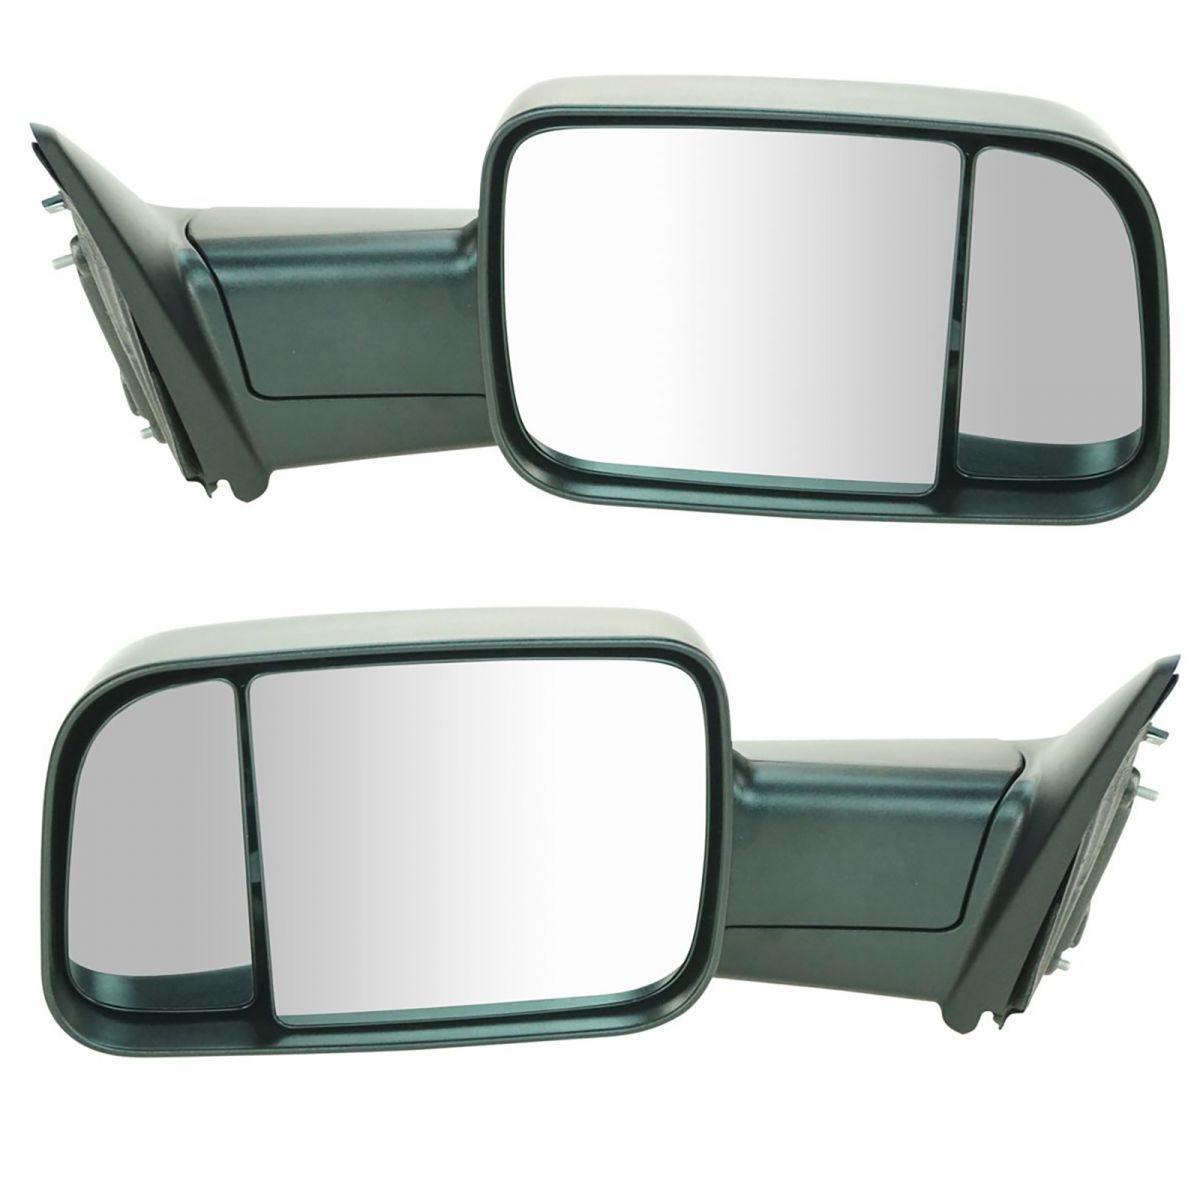 New Passenger Side Mirror For Ram 2500 2011-2012 CH1321314